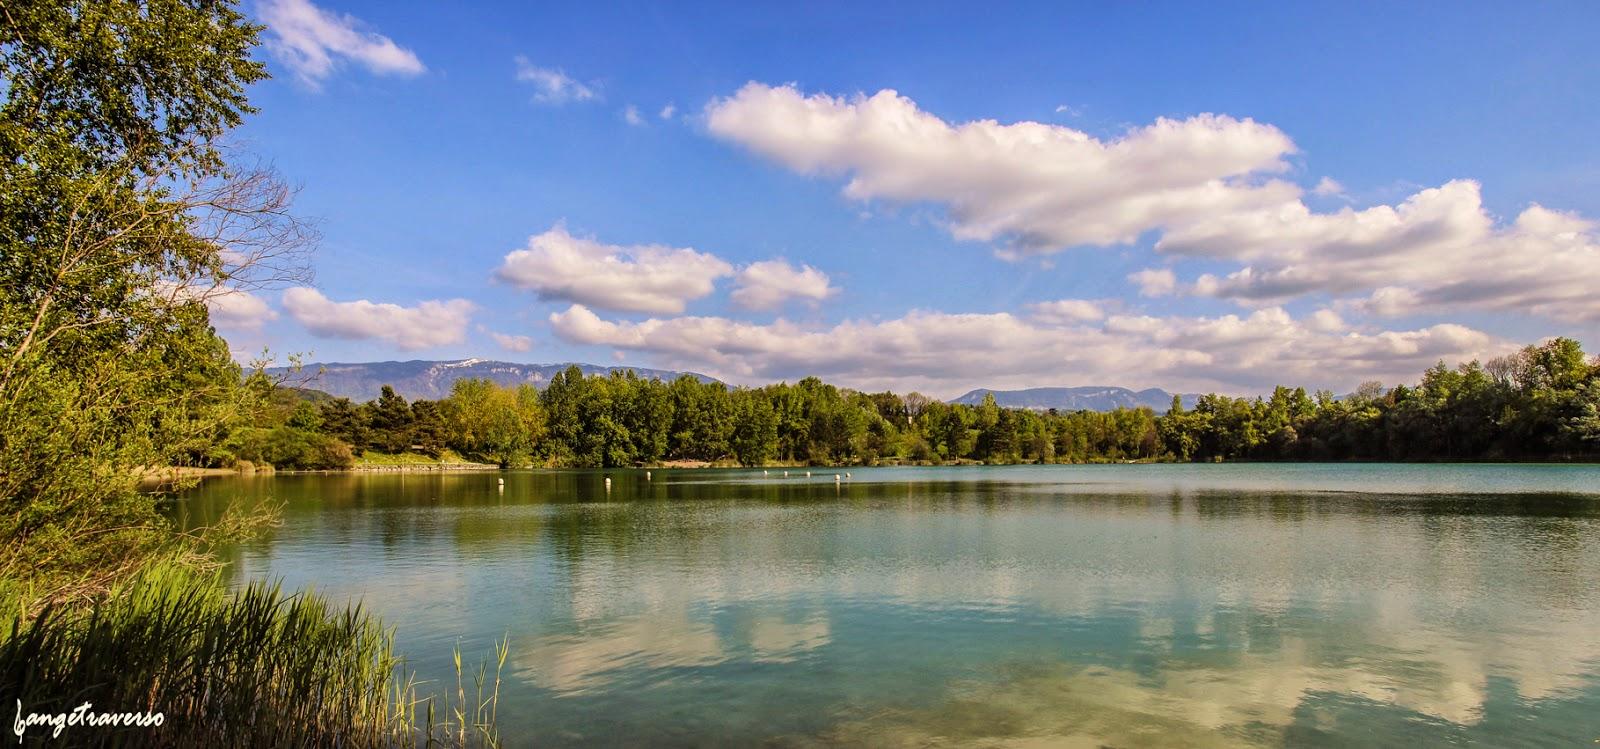 Haute-Savoie, Rhones Alpes